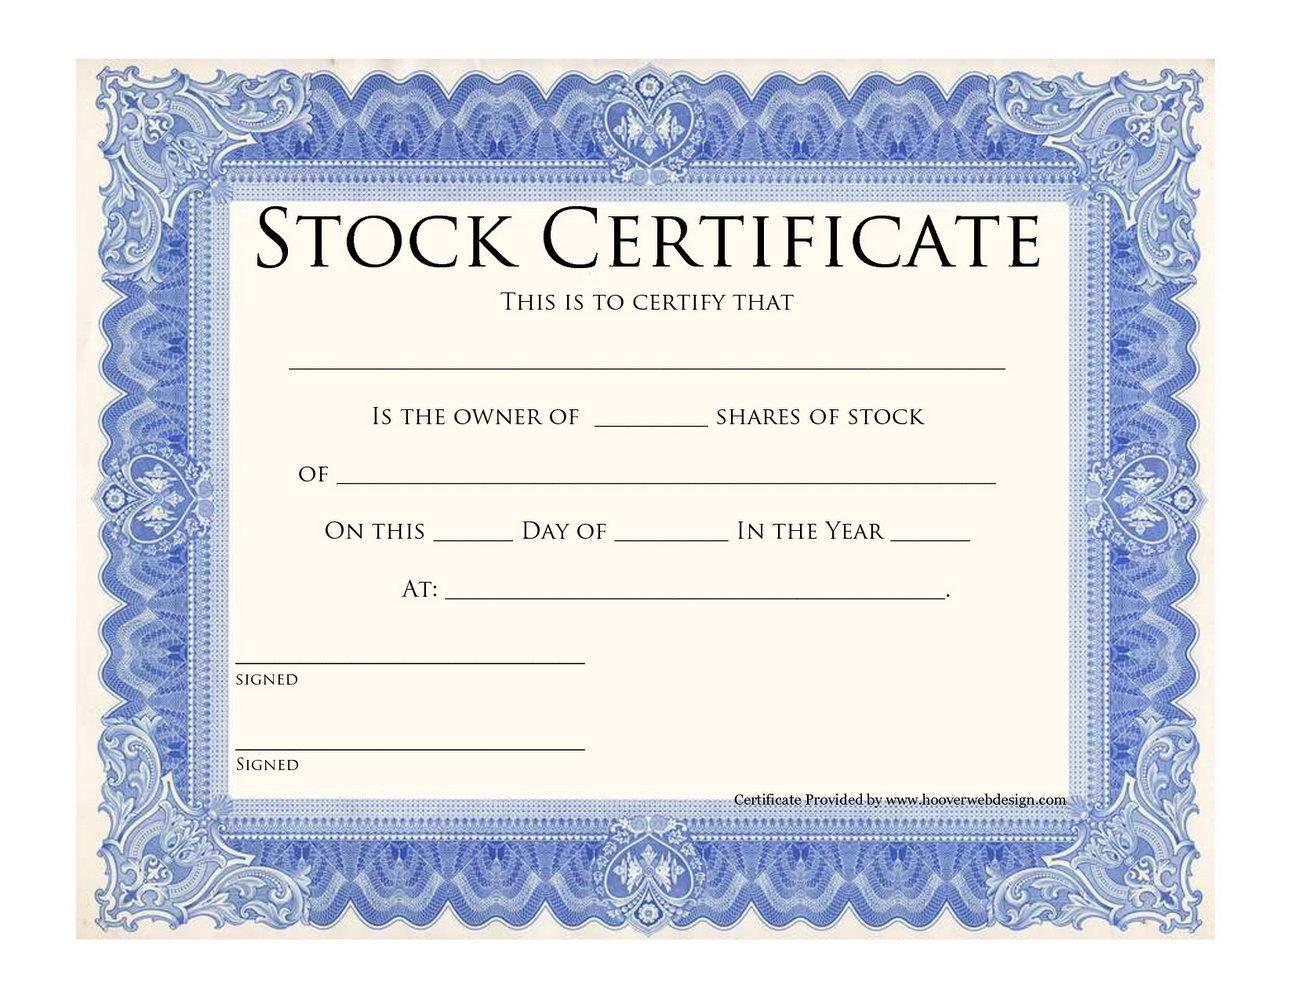 Stock Certificate Template Word